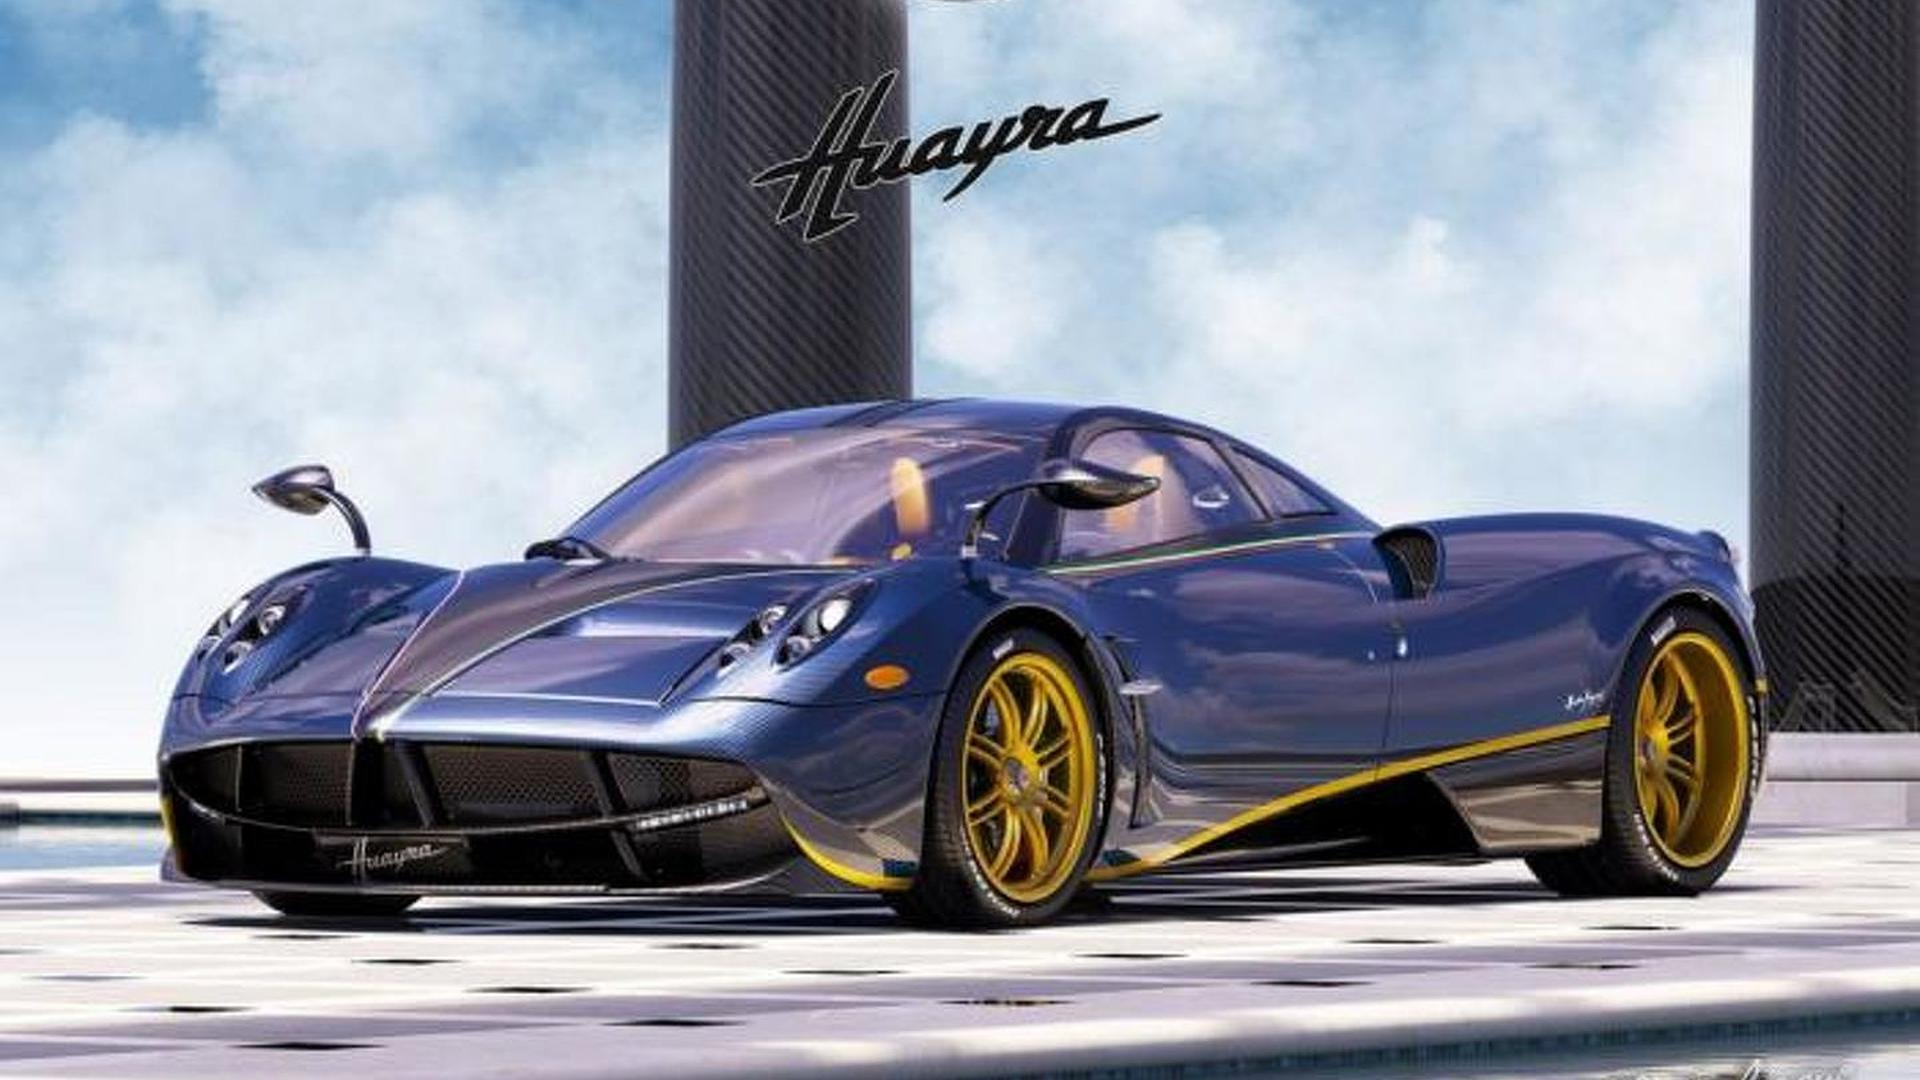 Pagani Huayra 730 S one-off previewed